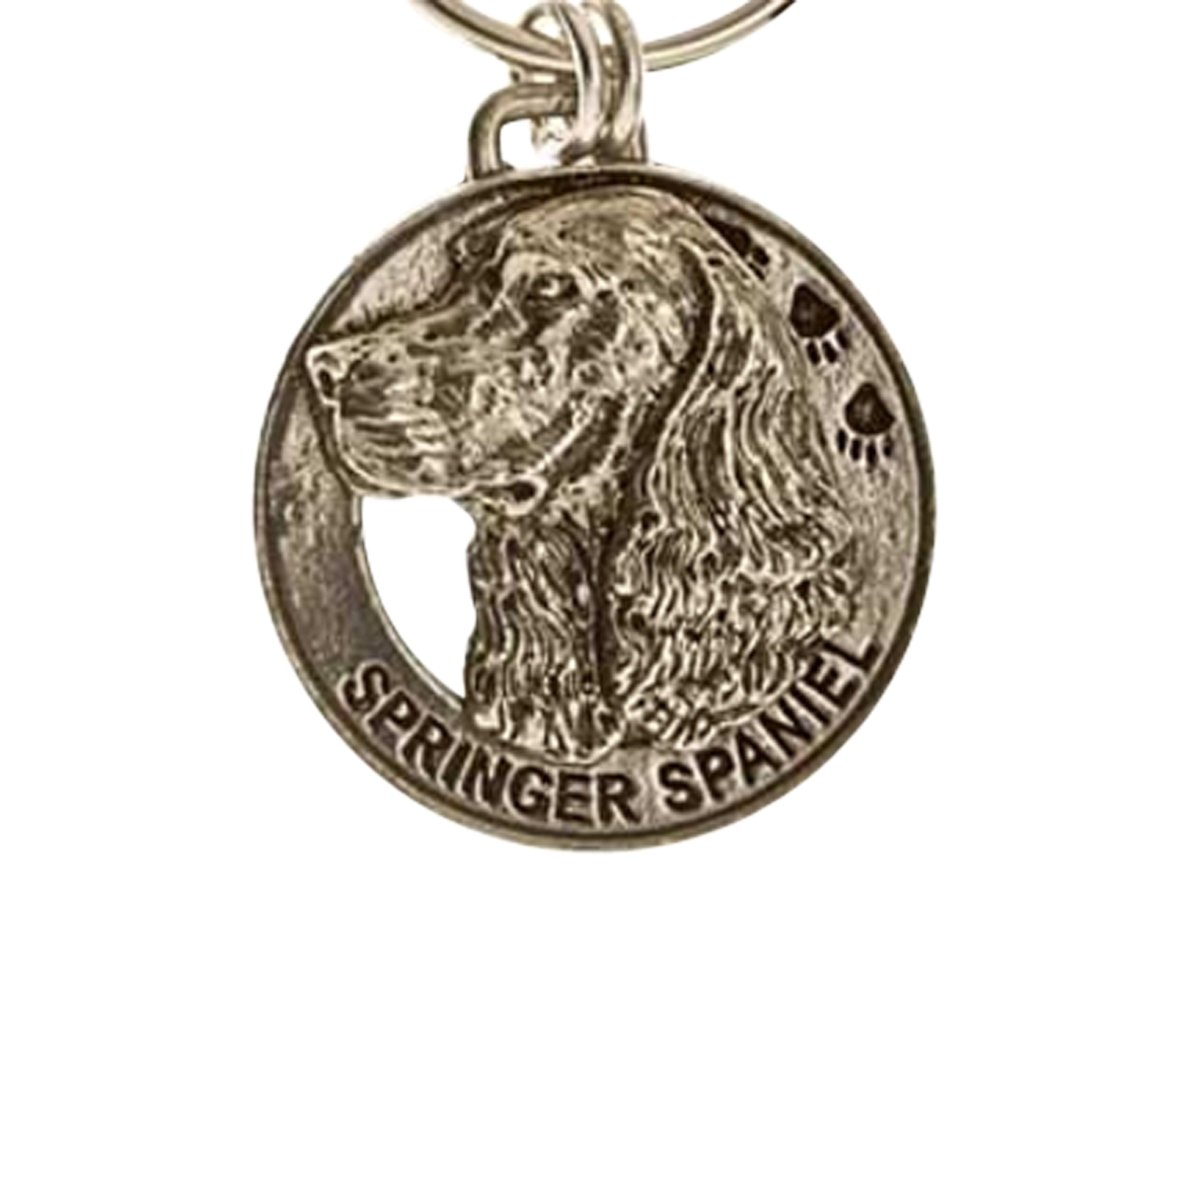 Creative Pewter Designs, Pewter Springer Spaniel Key Chain, Antiqued Finish, DK172